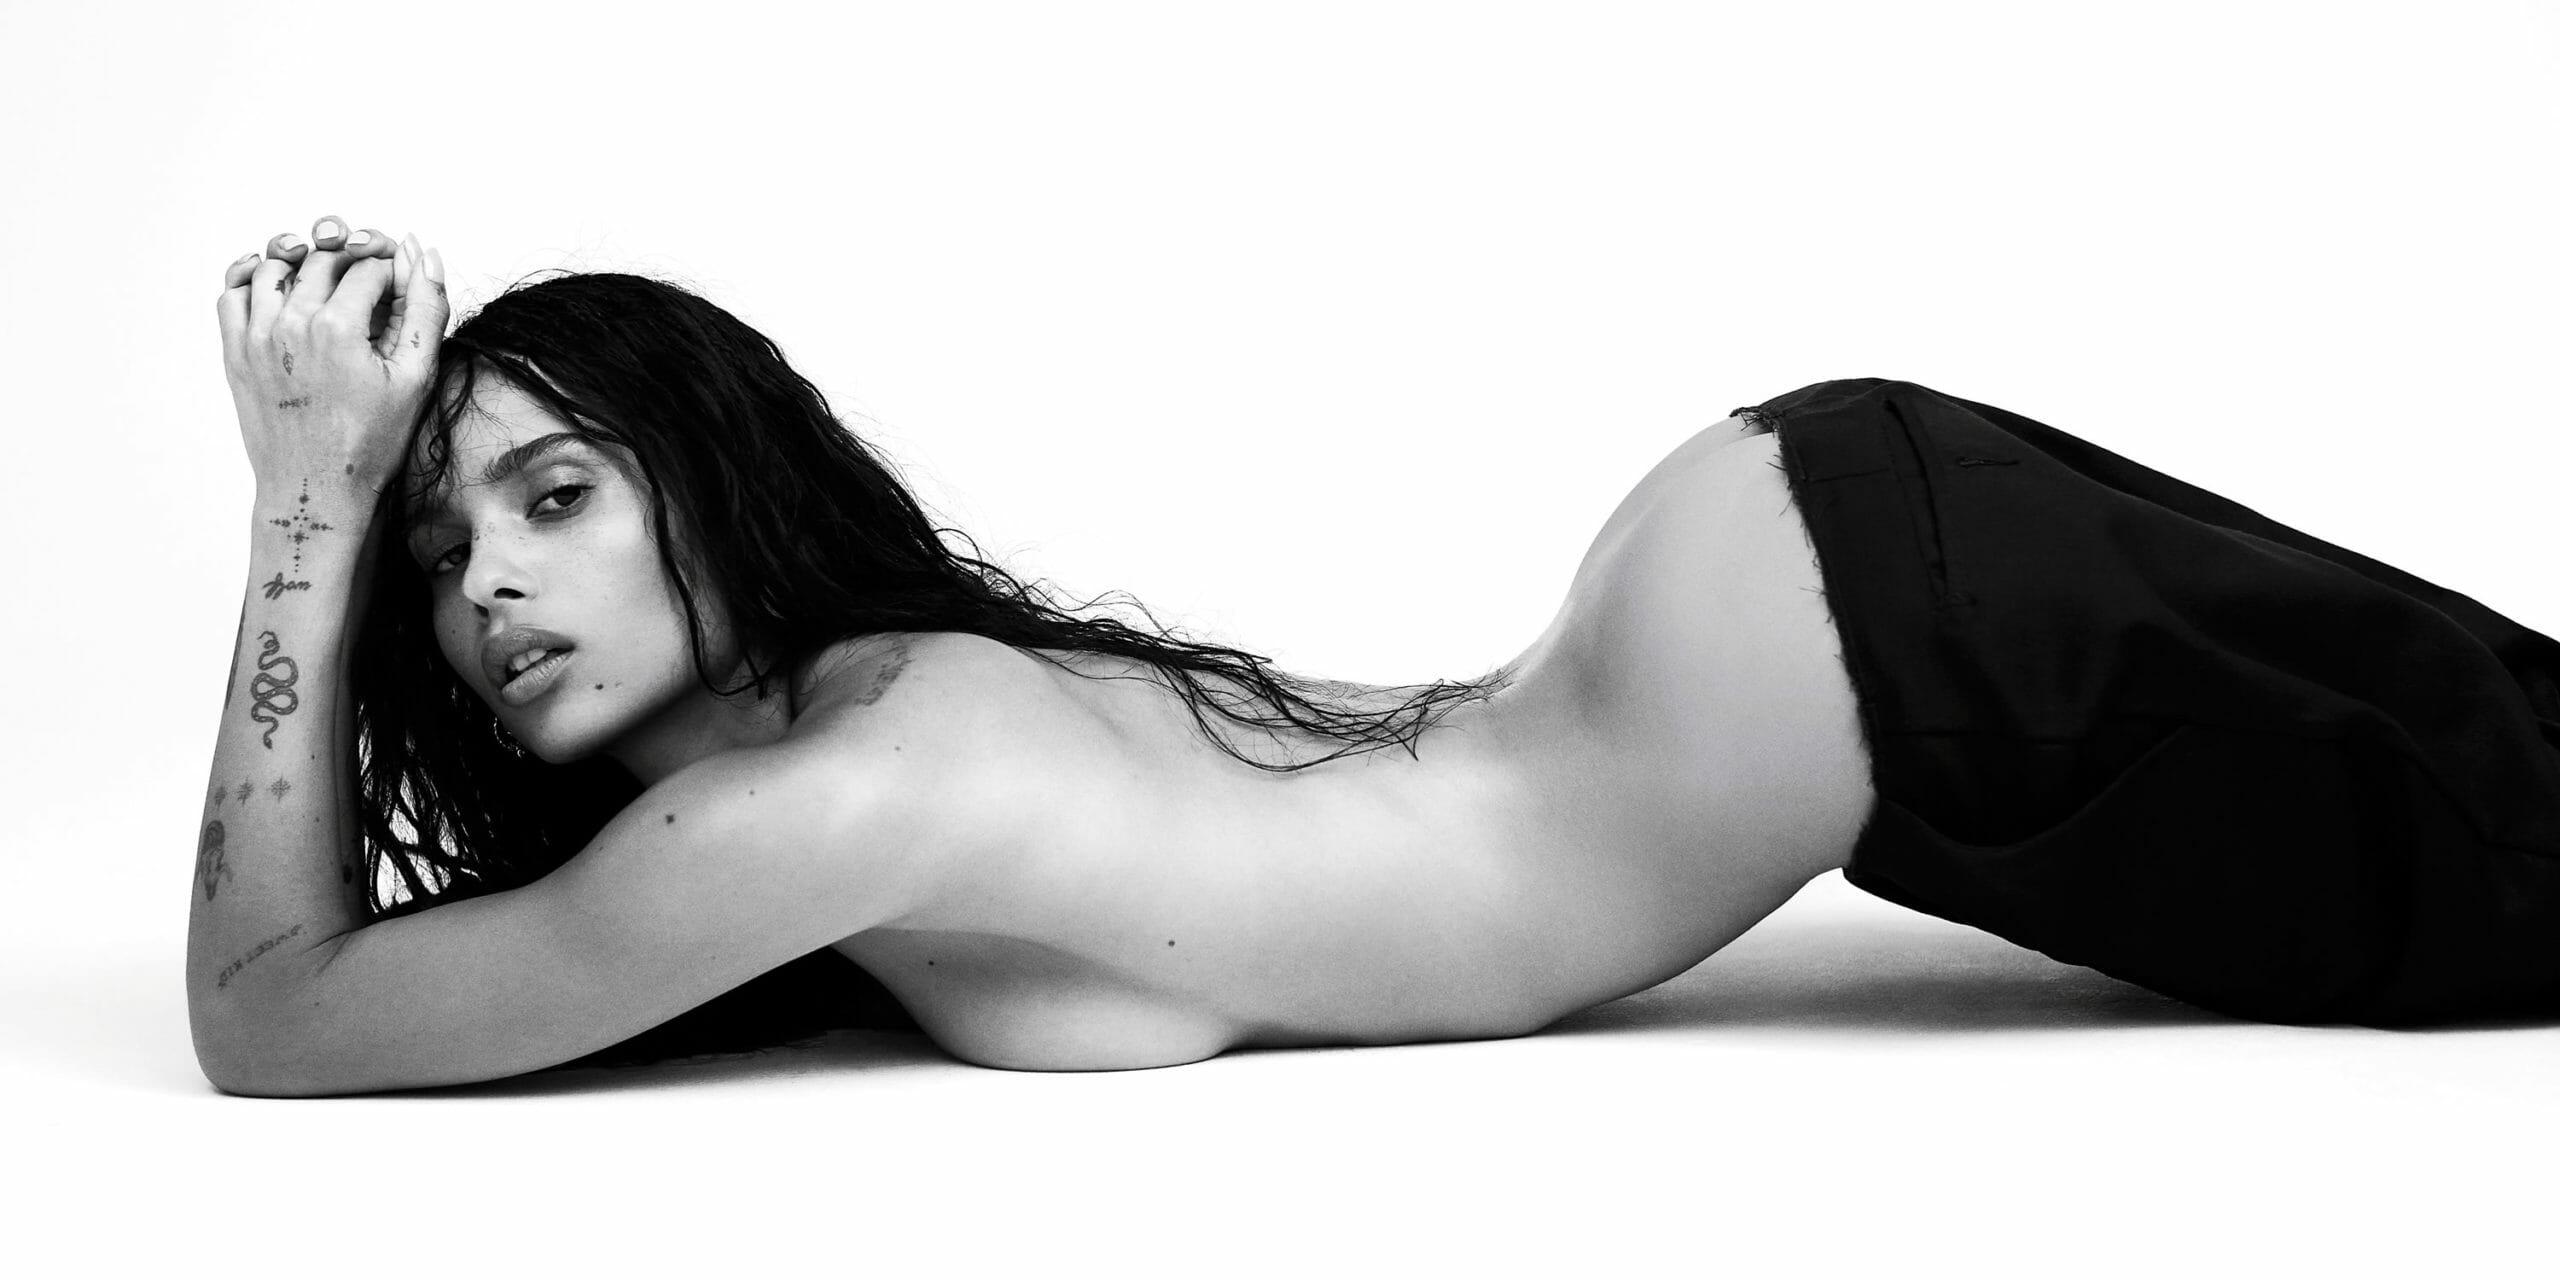 Zoe Kravitz topless modeling photo